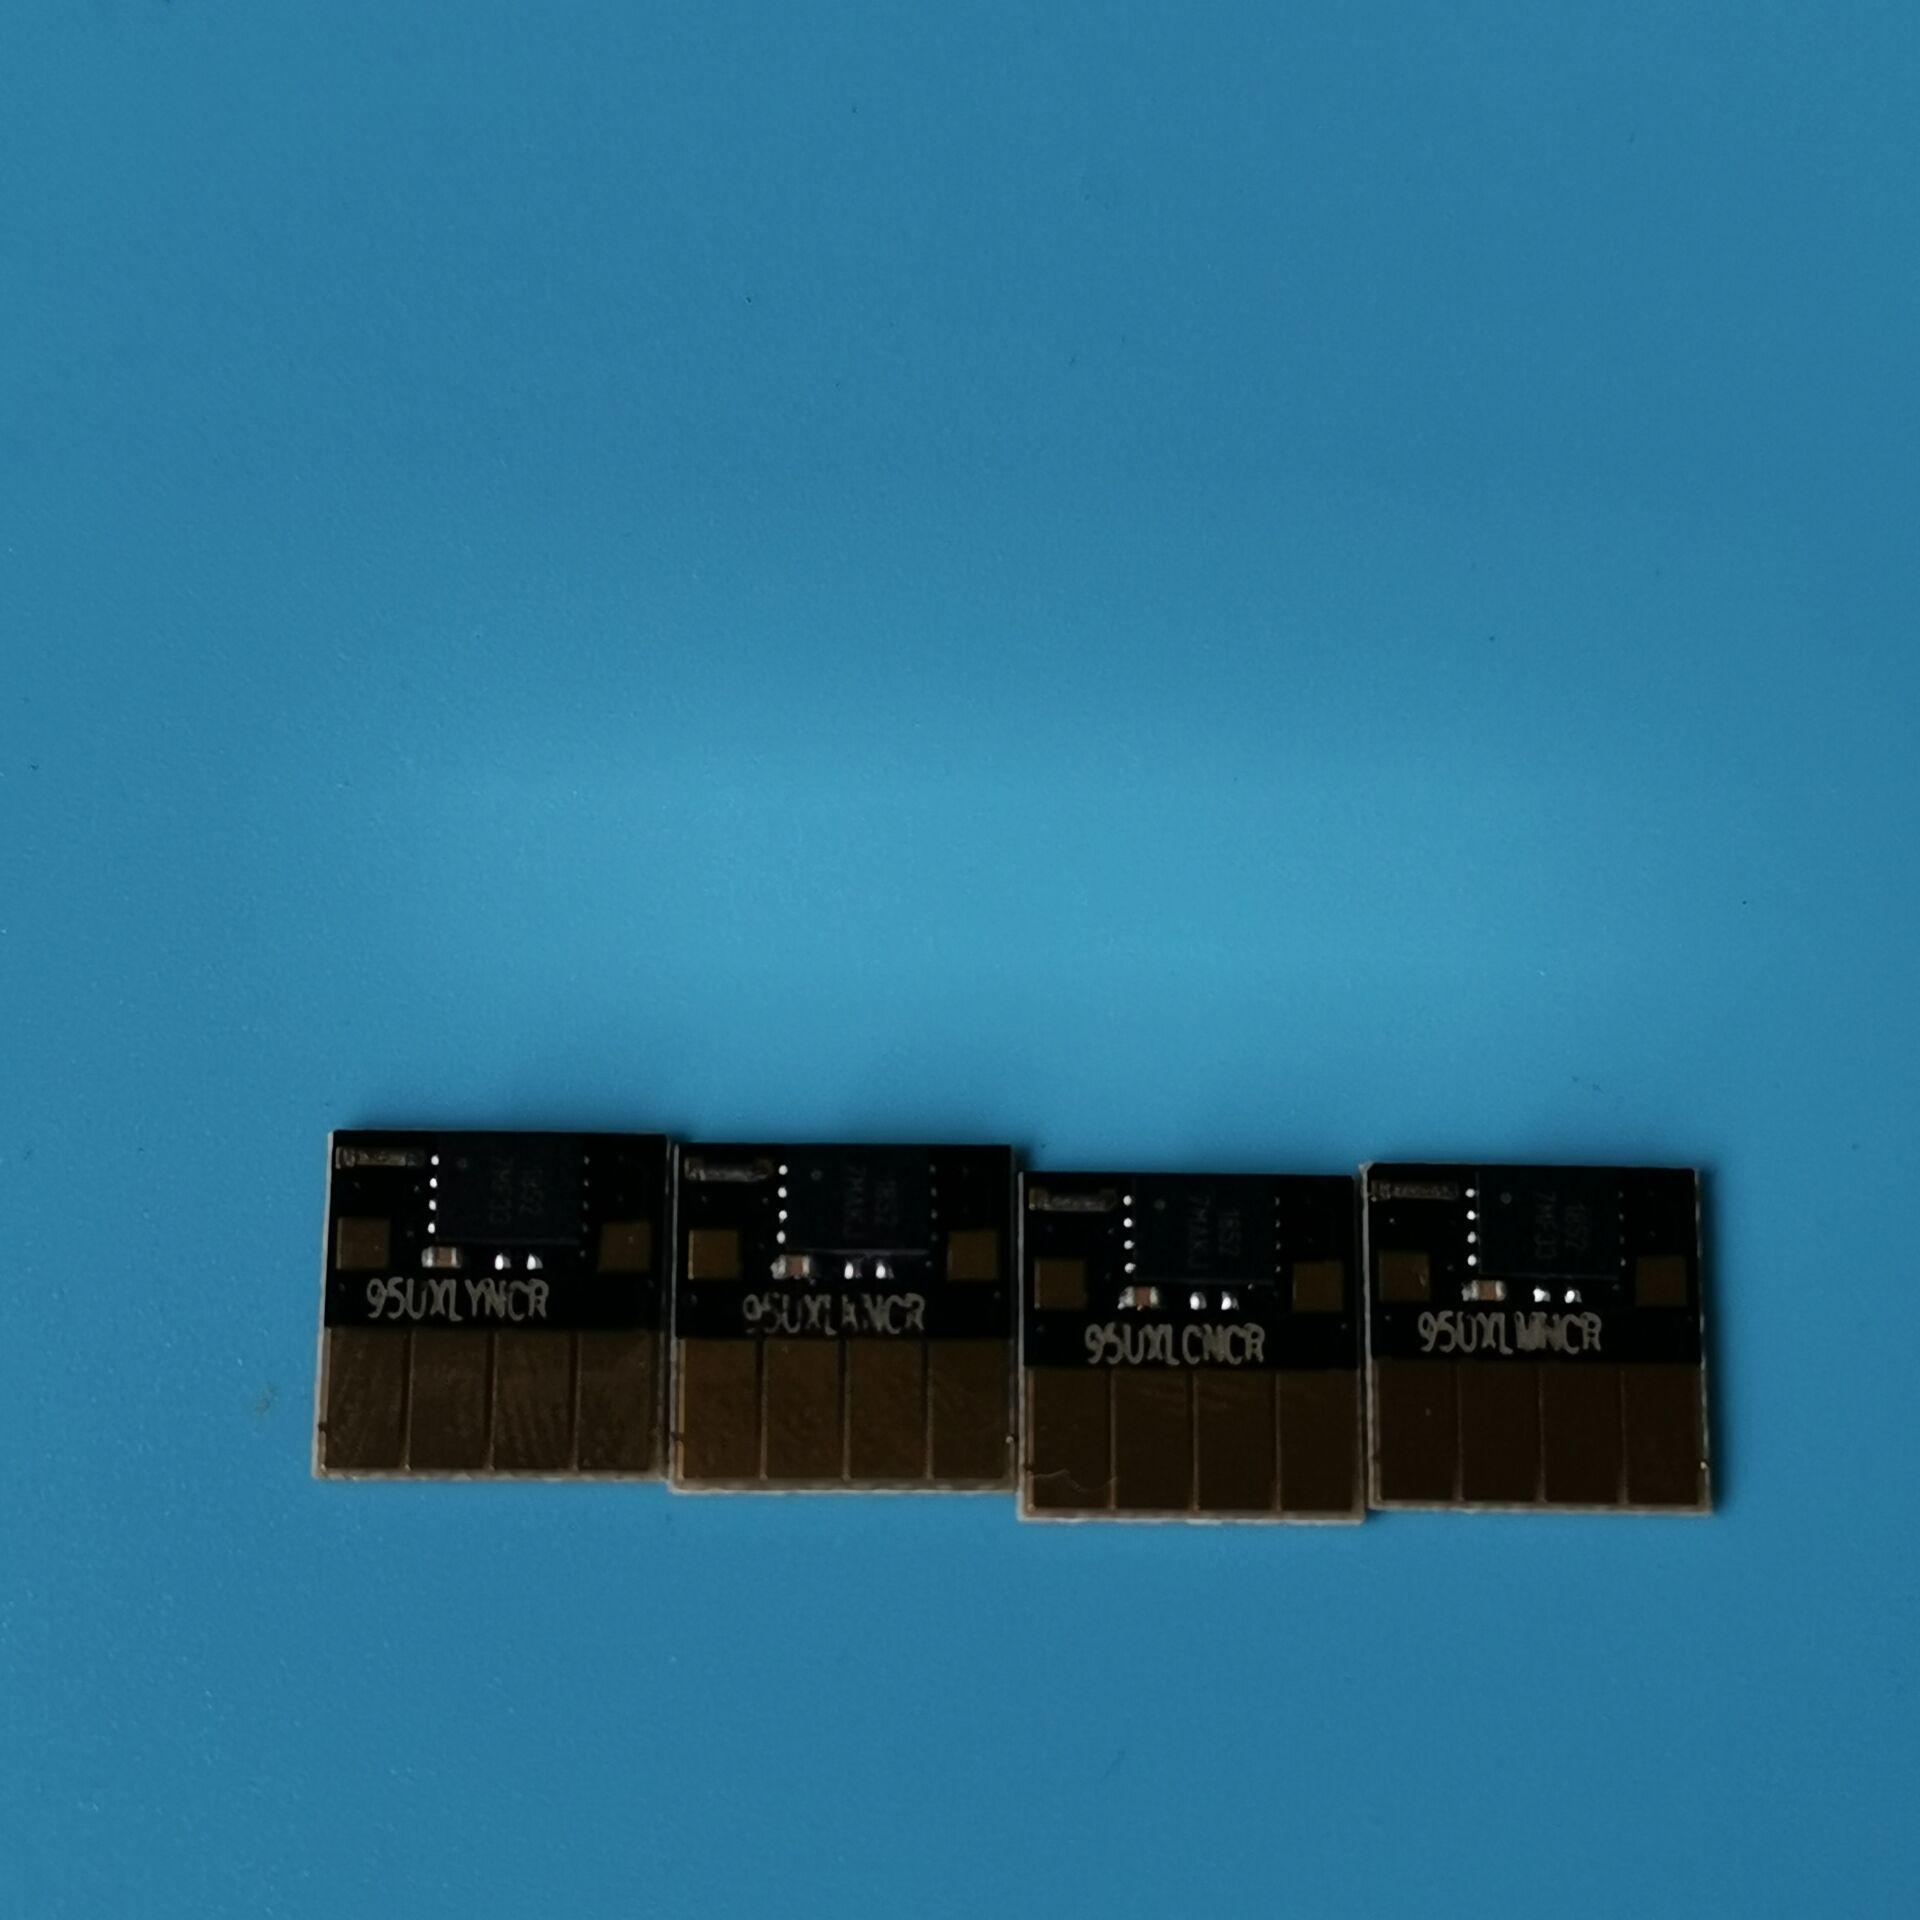 version V5 ARC chip for HP 955 for HP OfficeJet Pro 7740 8210 8216 8710 8725